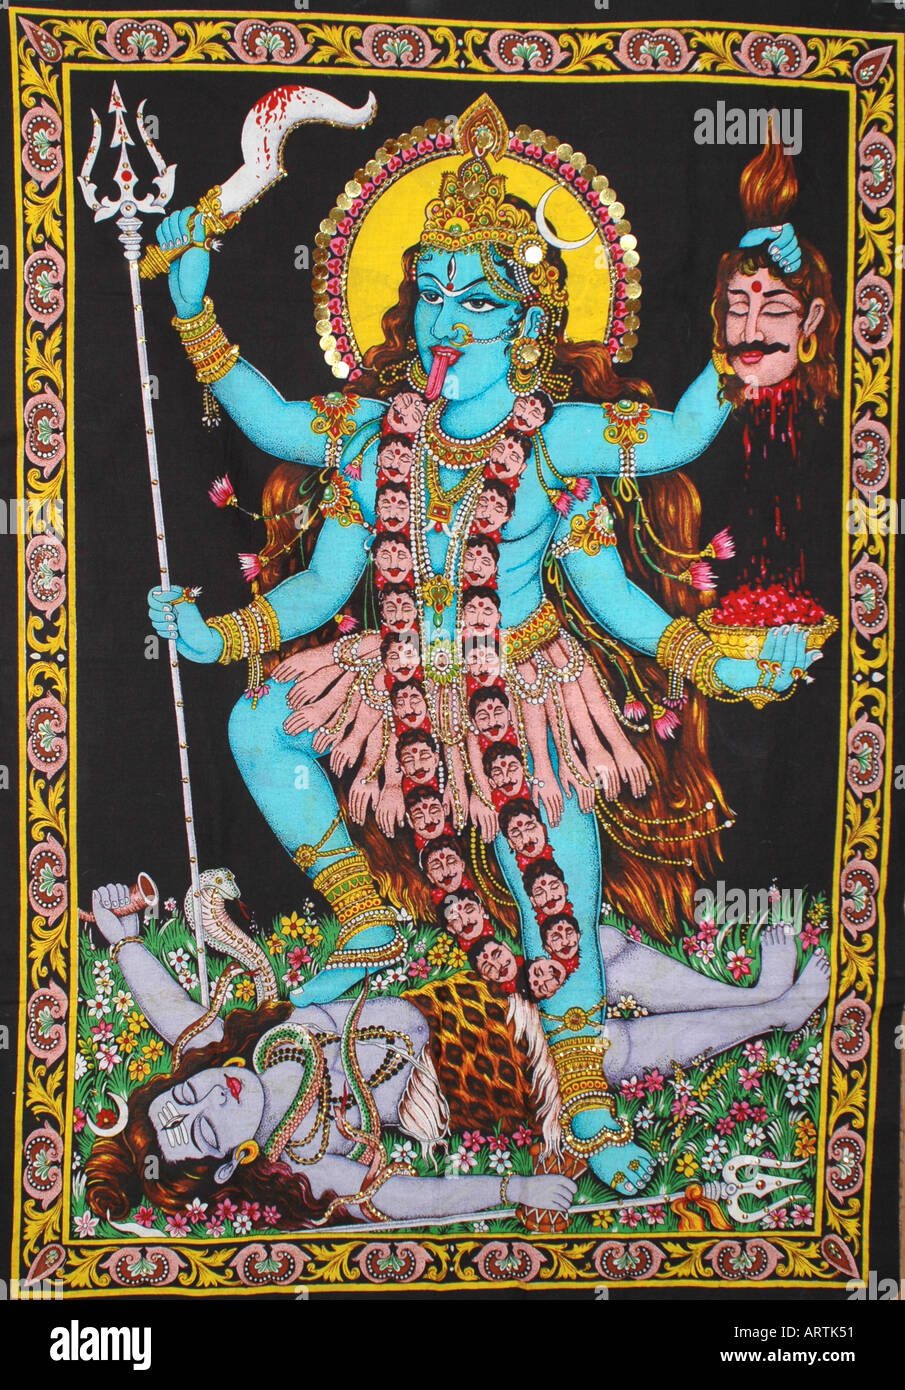 Indische Göttin Kali Stockfoto Bild 5264208 Alamy